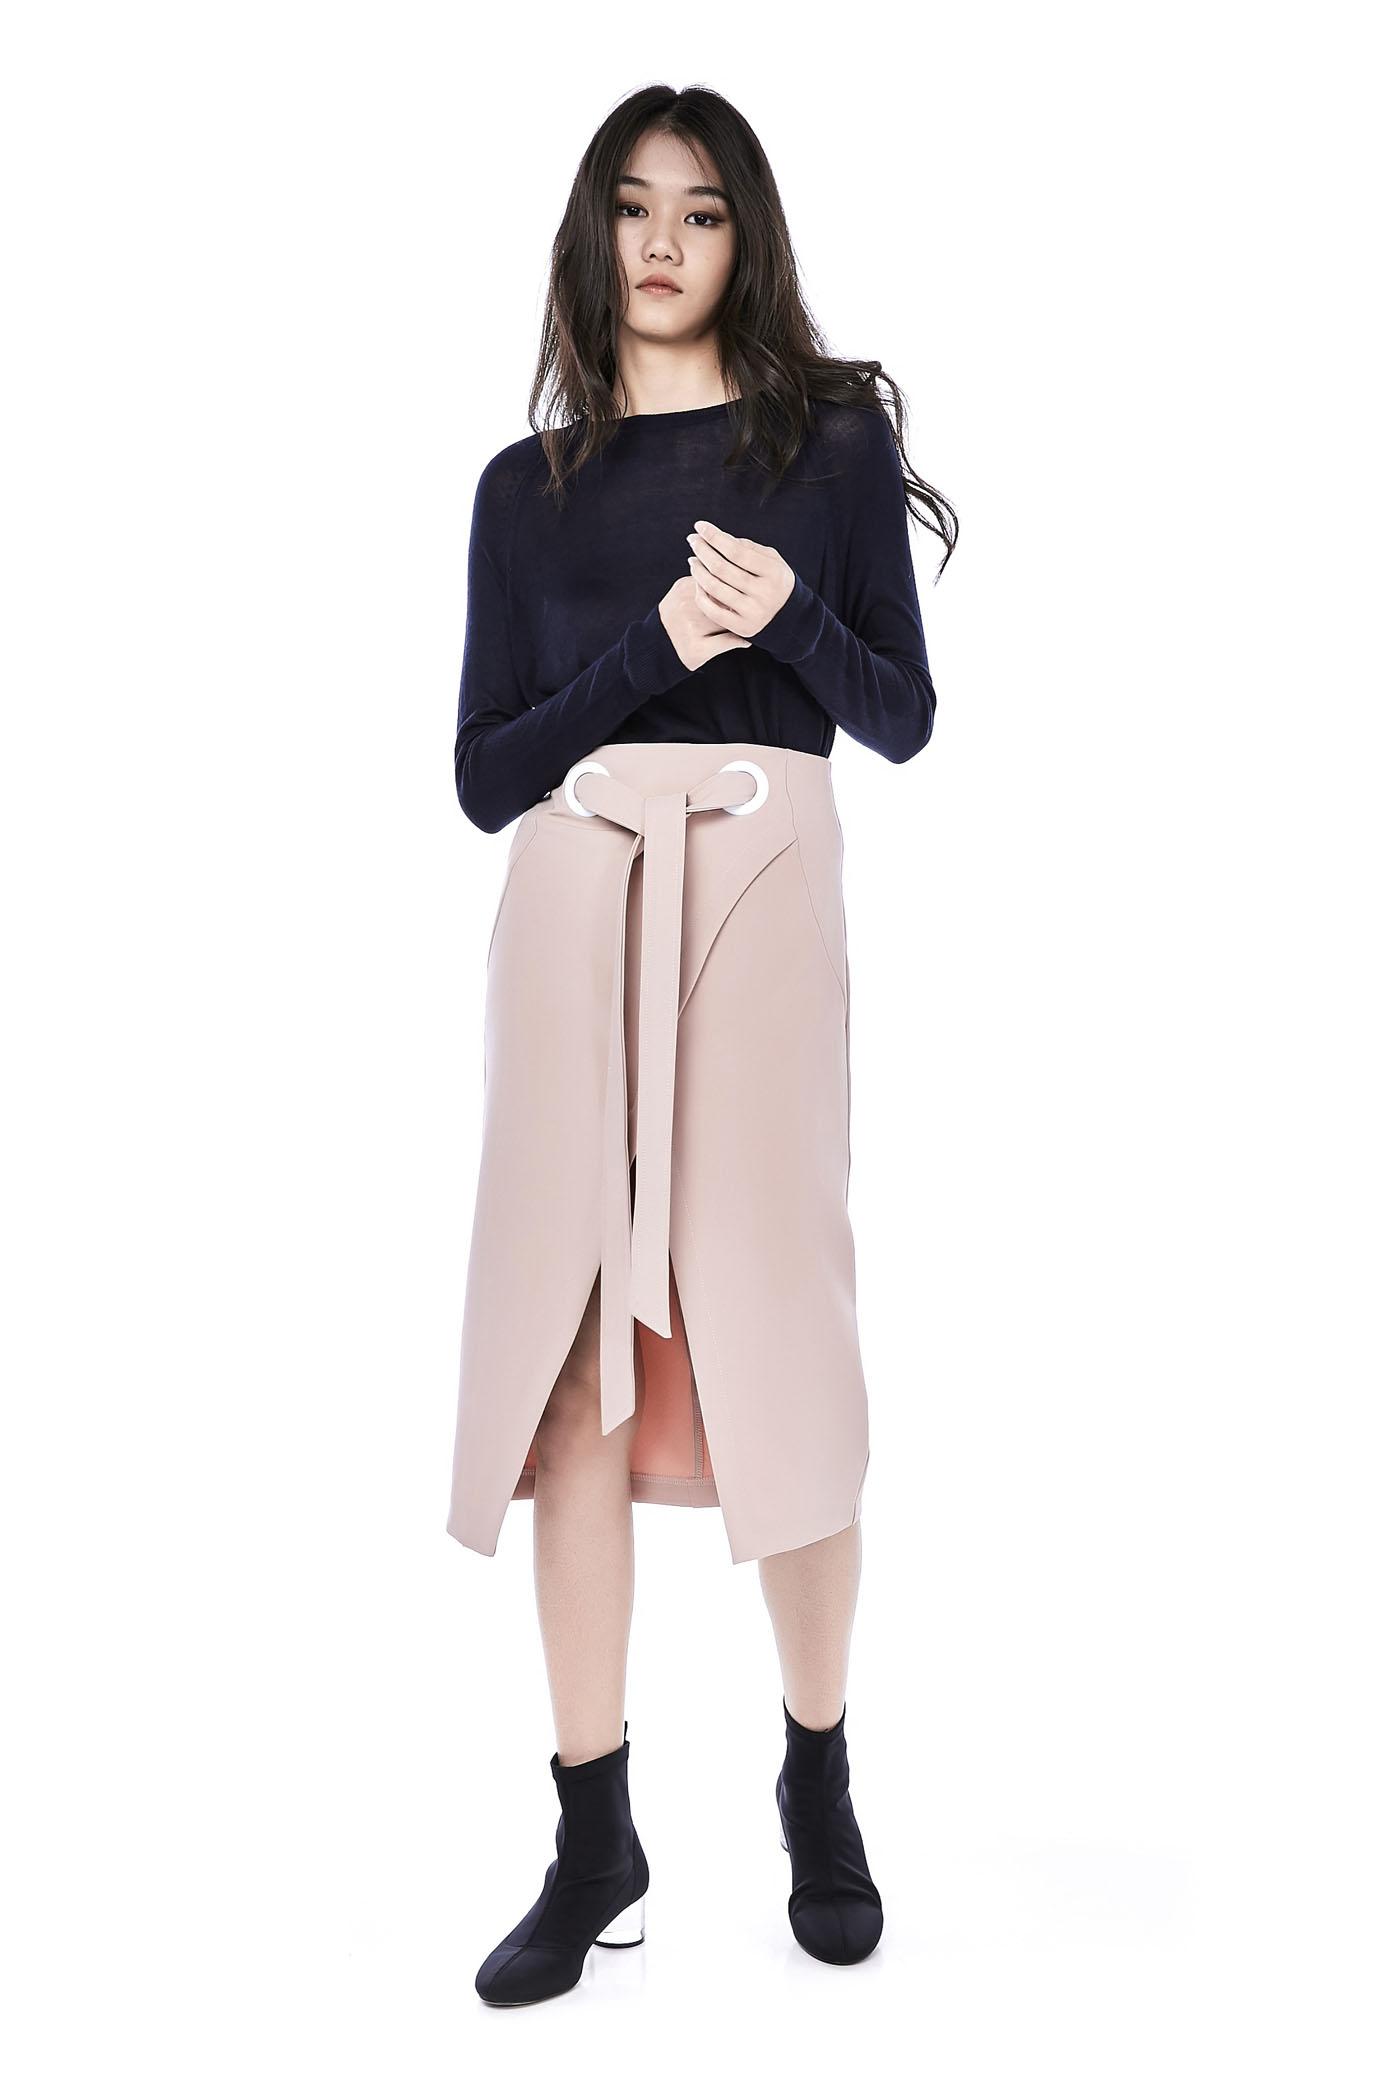 Lornie Overlap Skirt  998e191b45